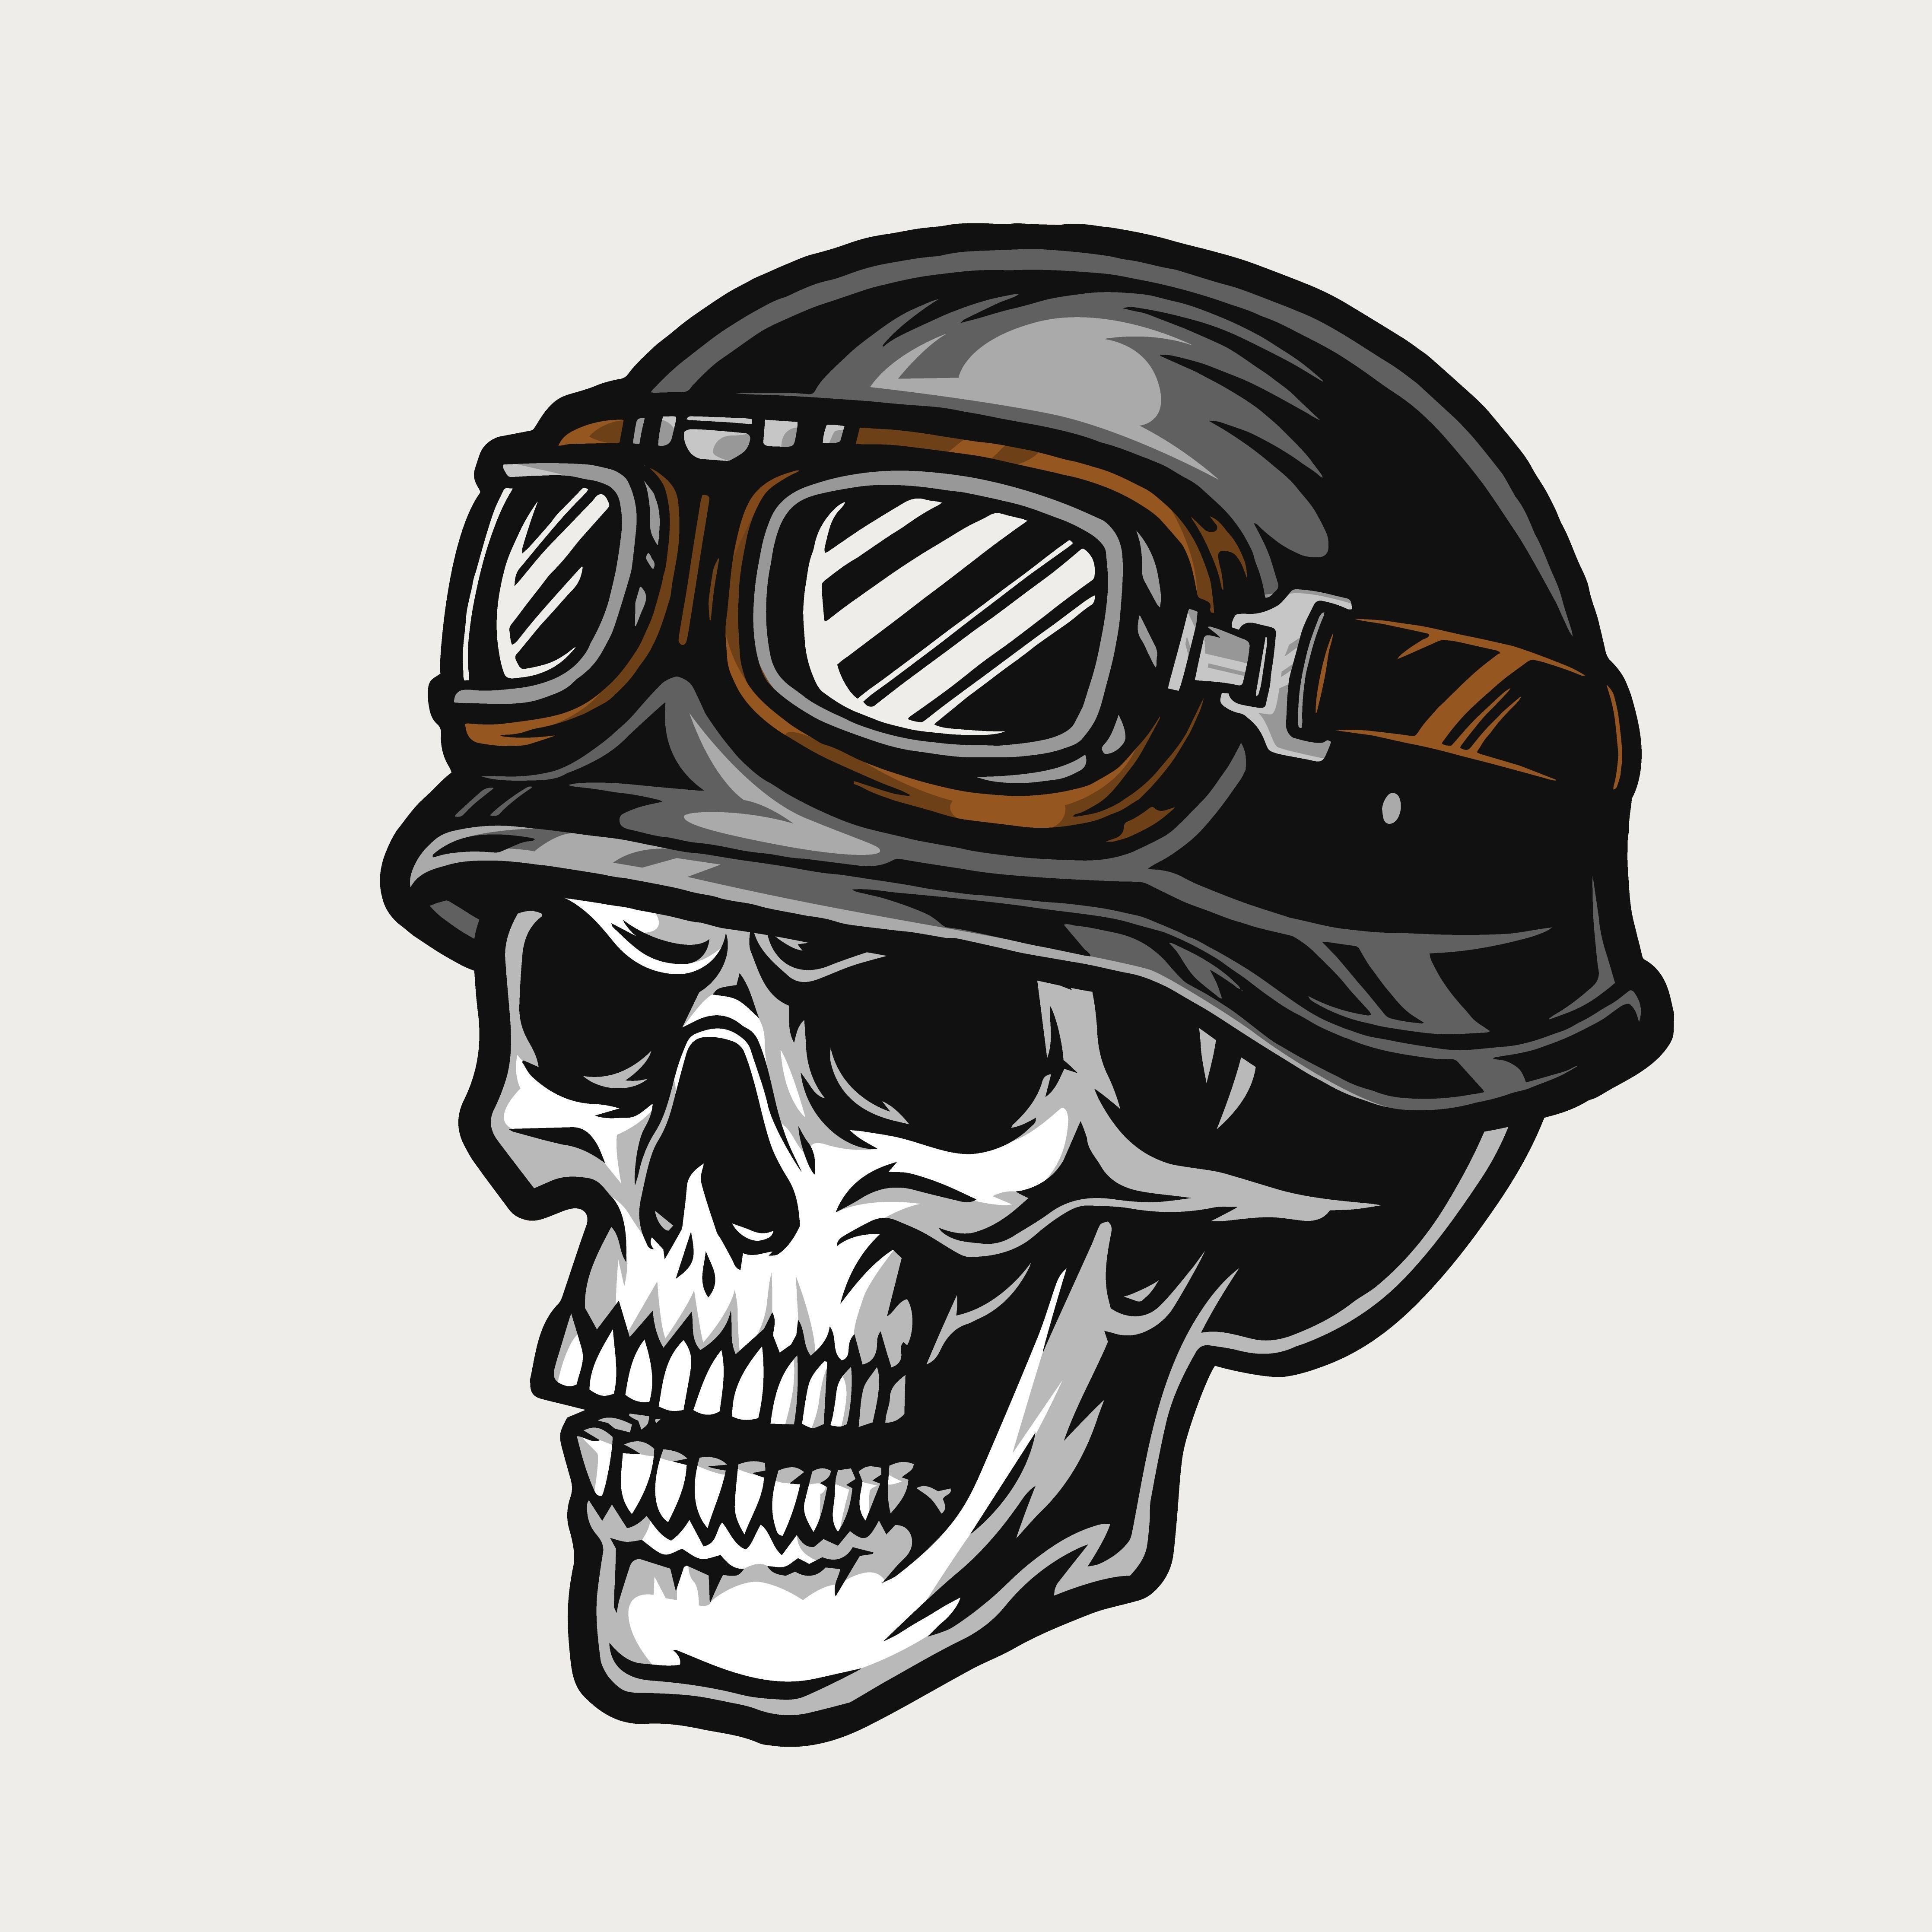 37 Vintage Custom Motorcycle Emblems In 2020 Custom Motorcycle Motorcycle Design Unique Poster